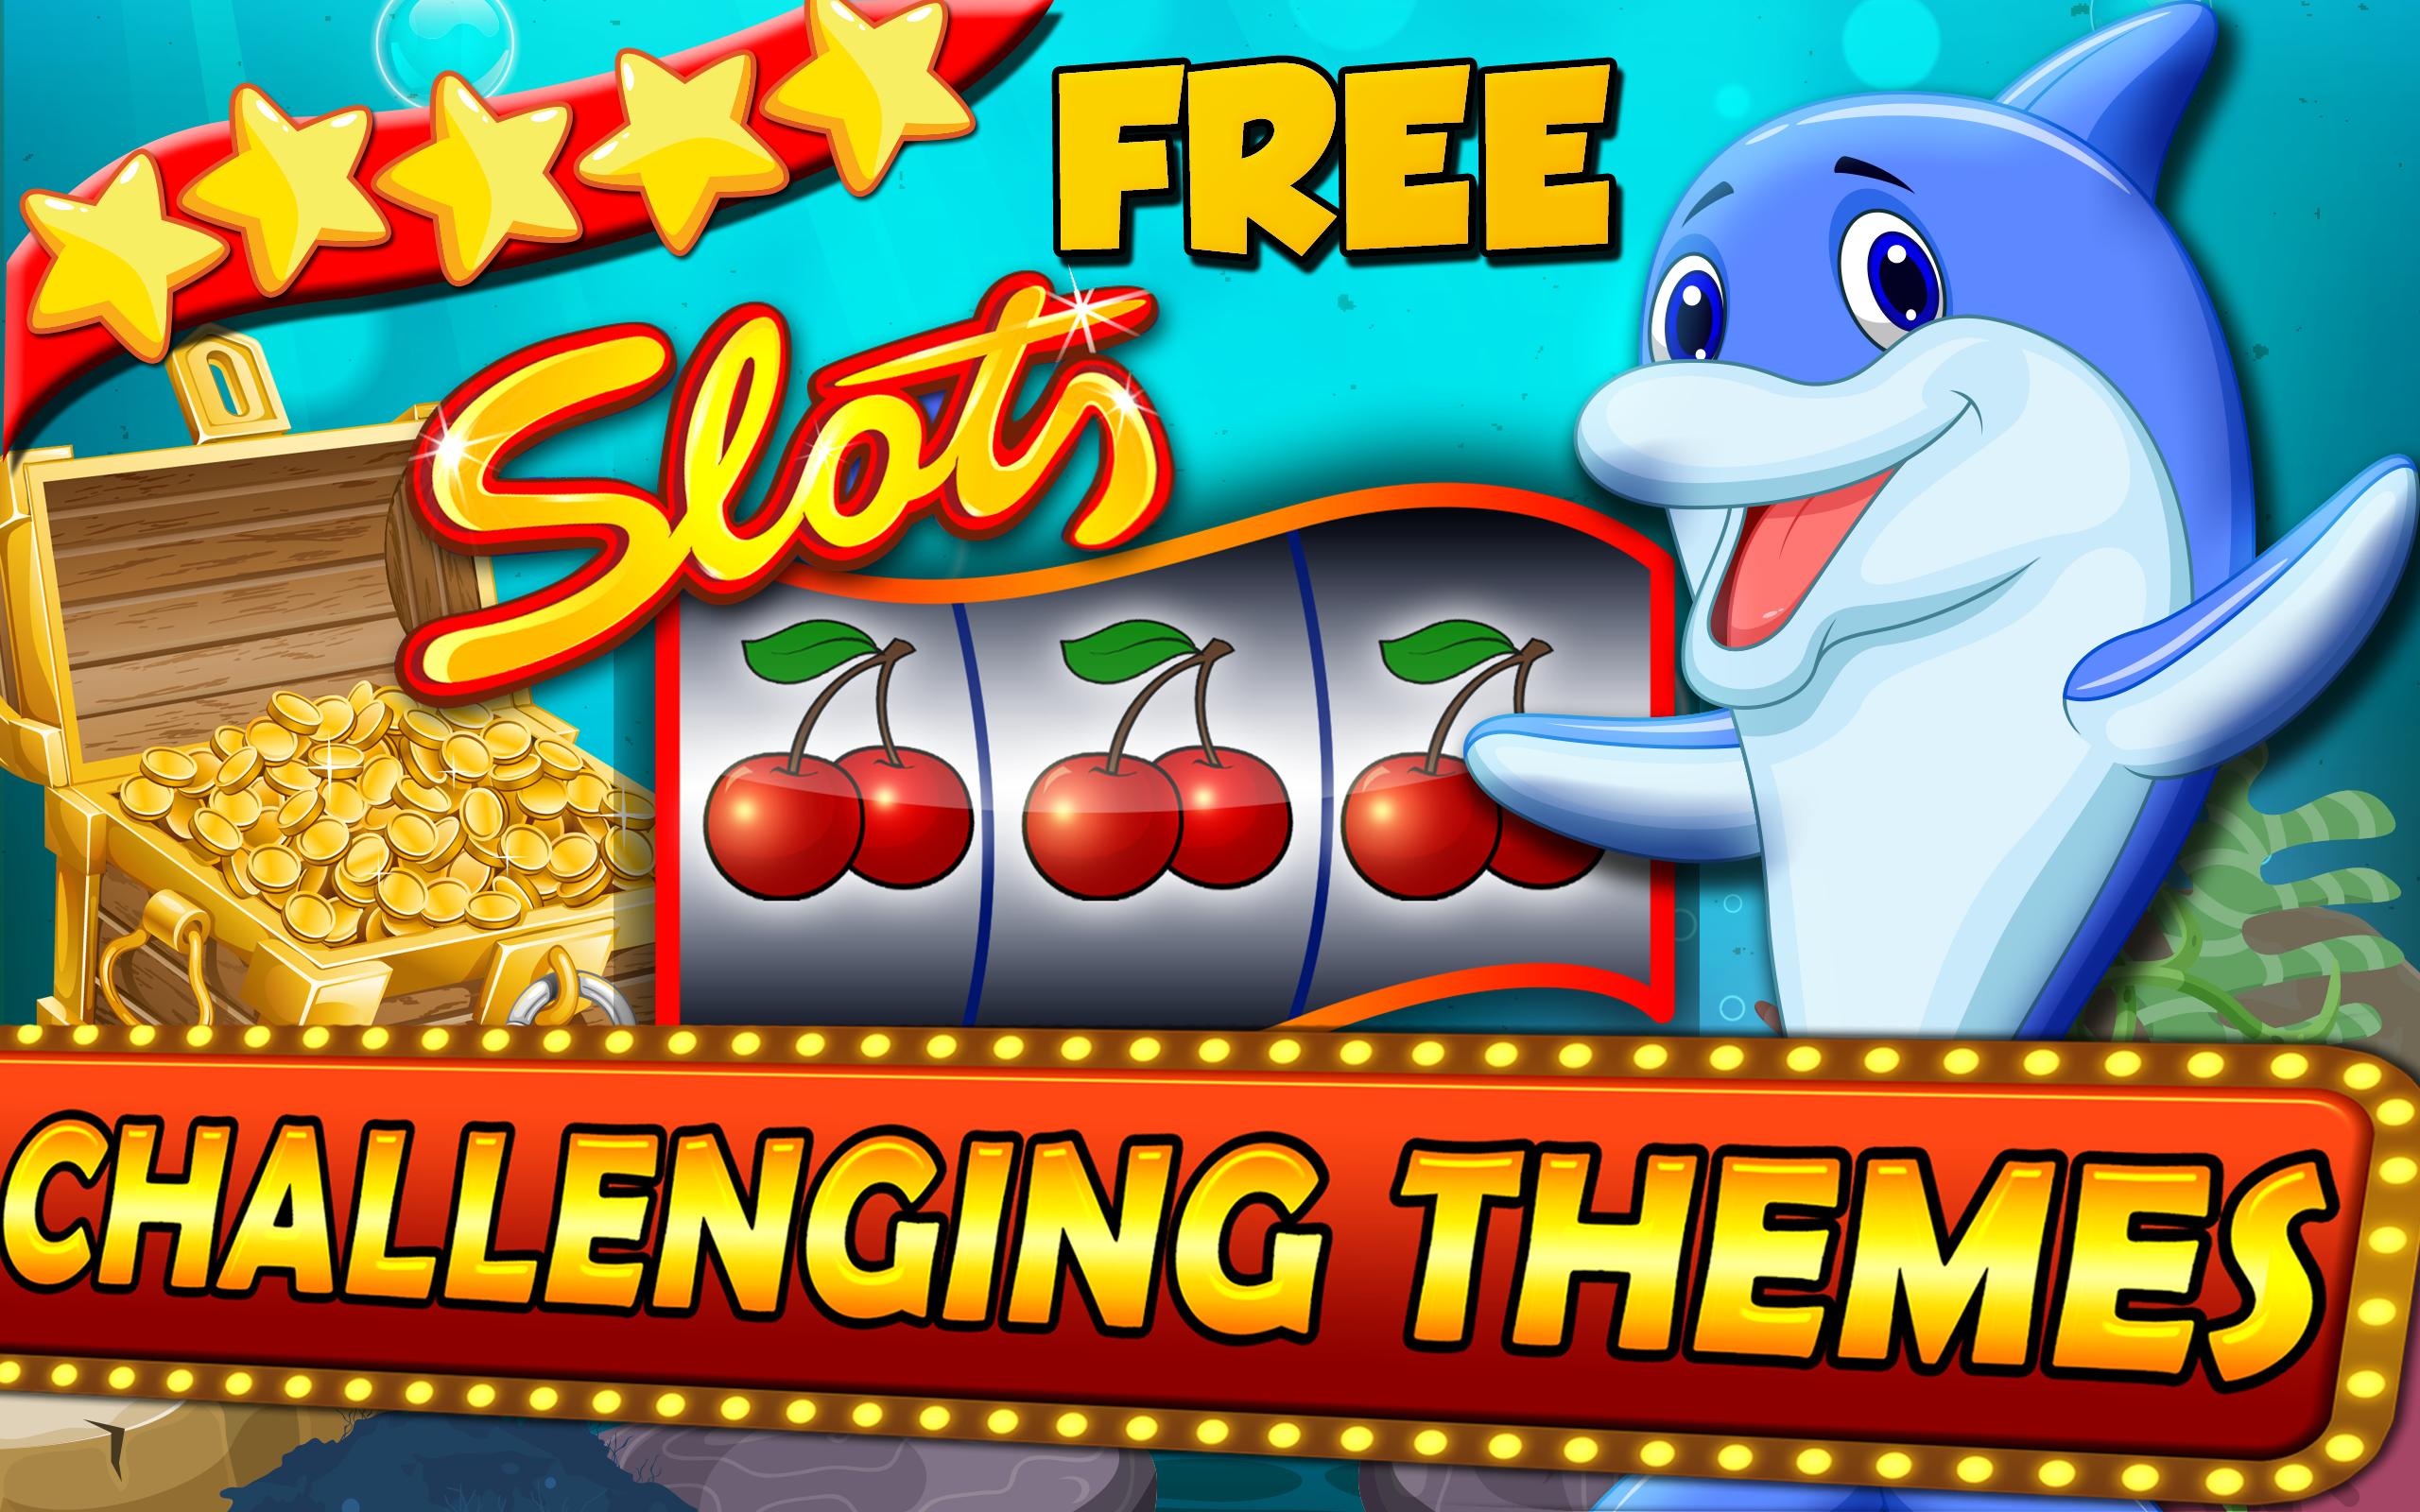 Jackpot Win Online Slots Erfahrung Mit Online Casino Deutschland Free Wicked Winnings Slot Game Safeguardgc